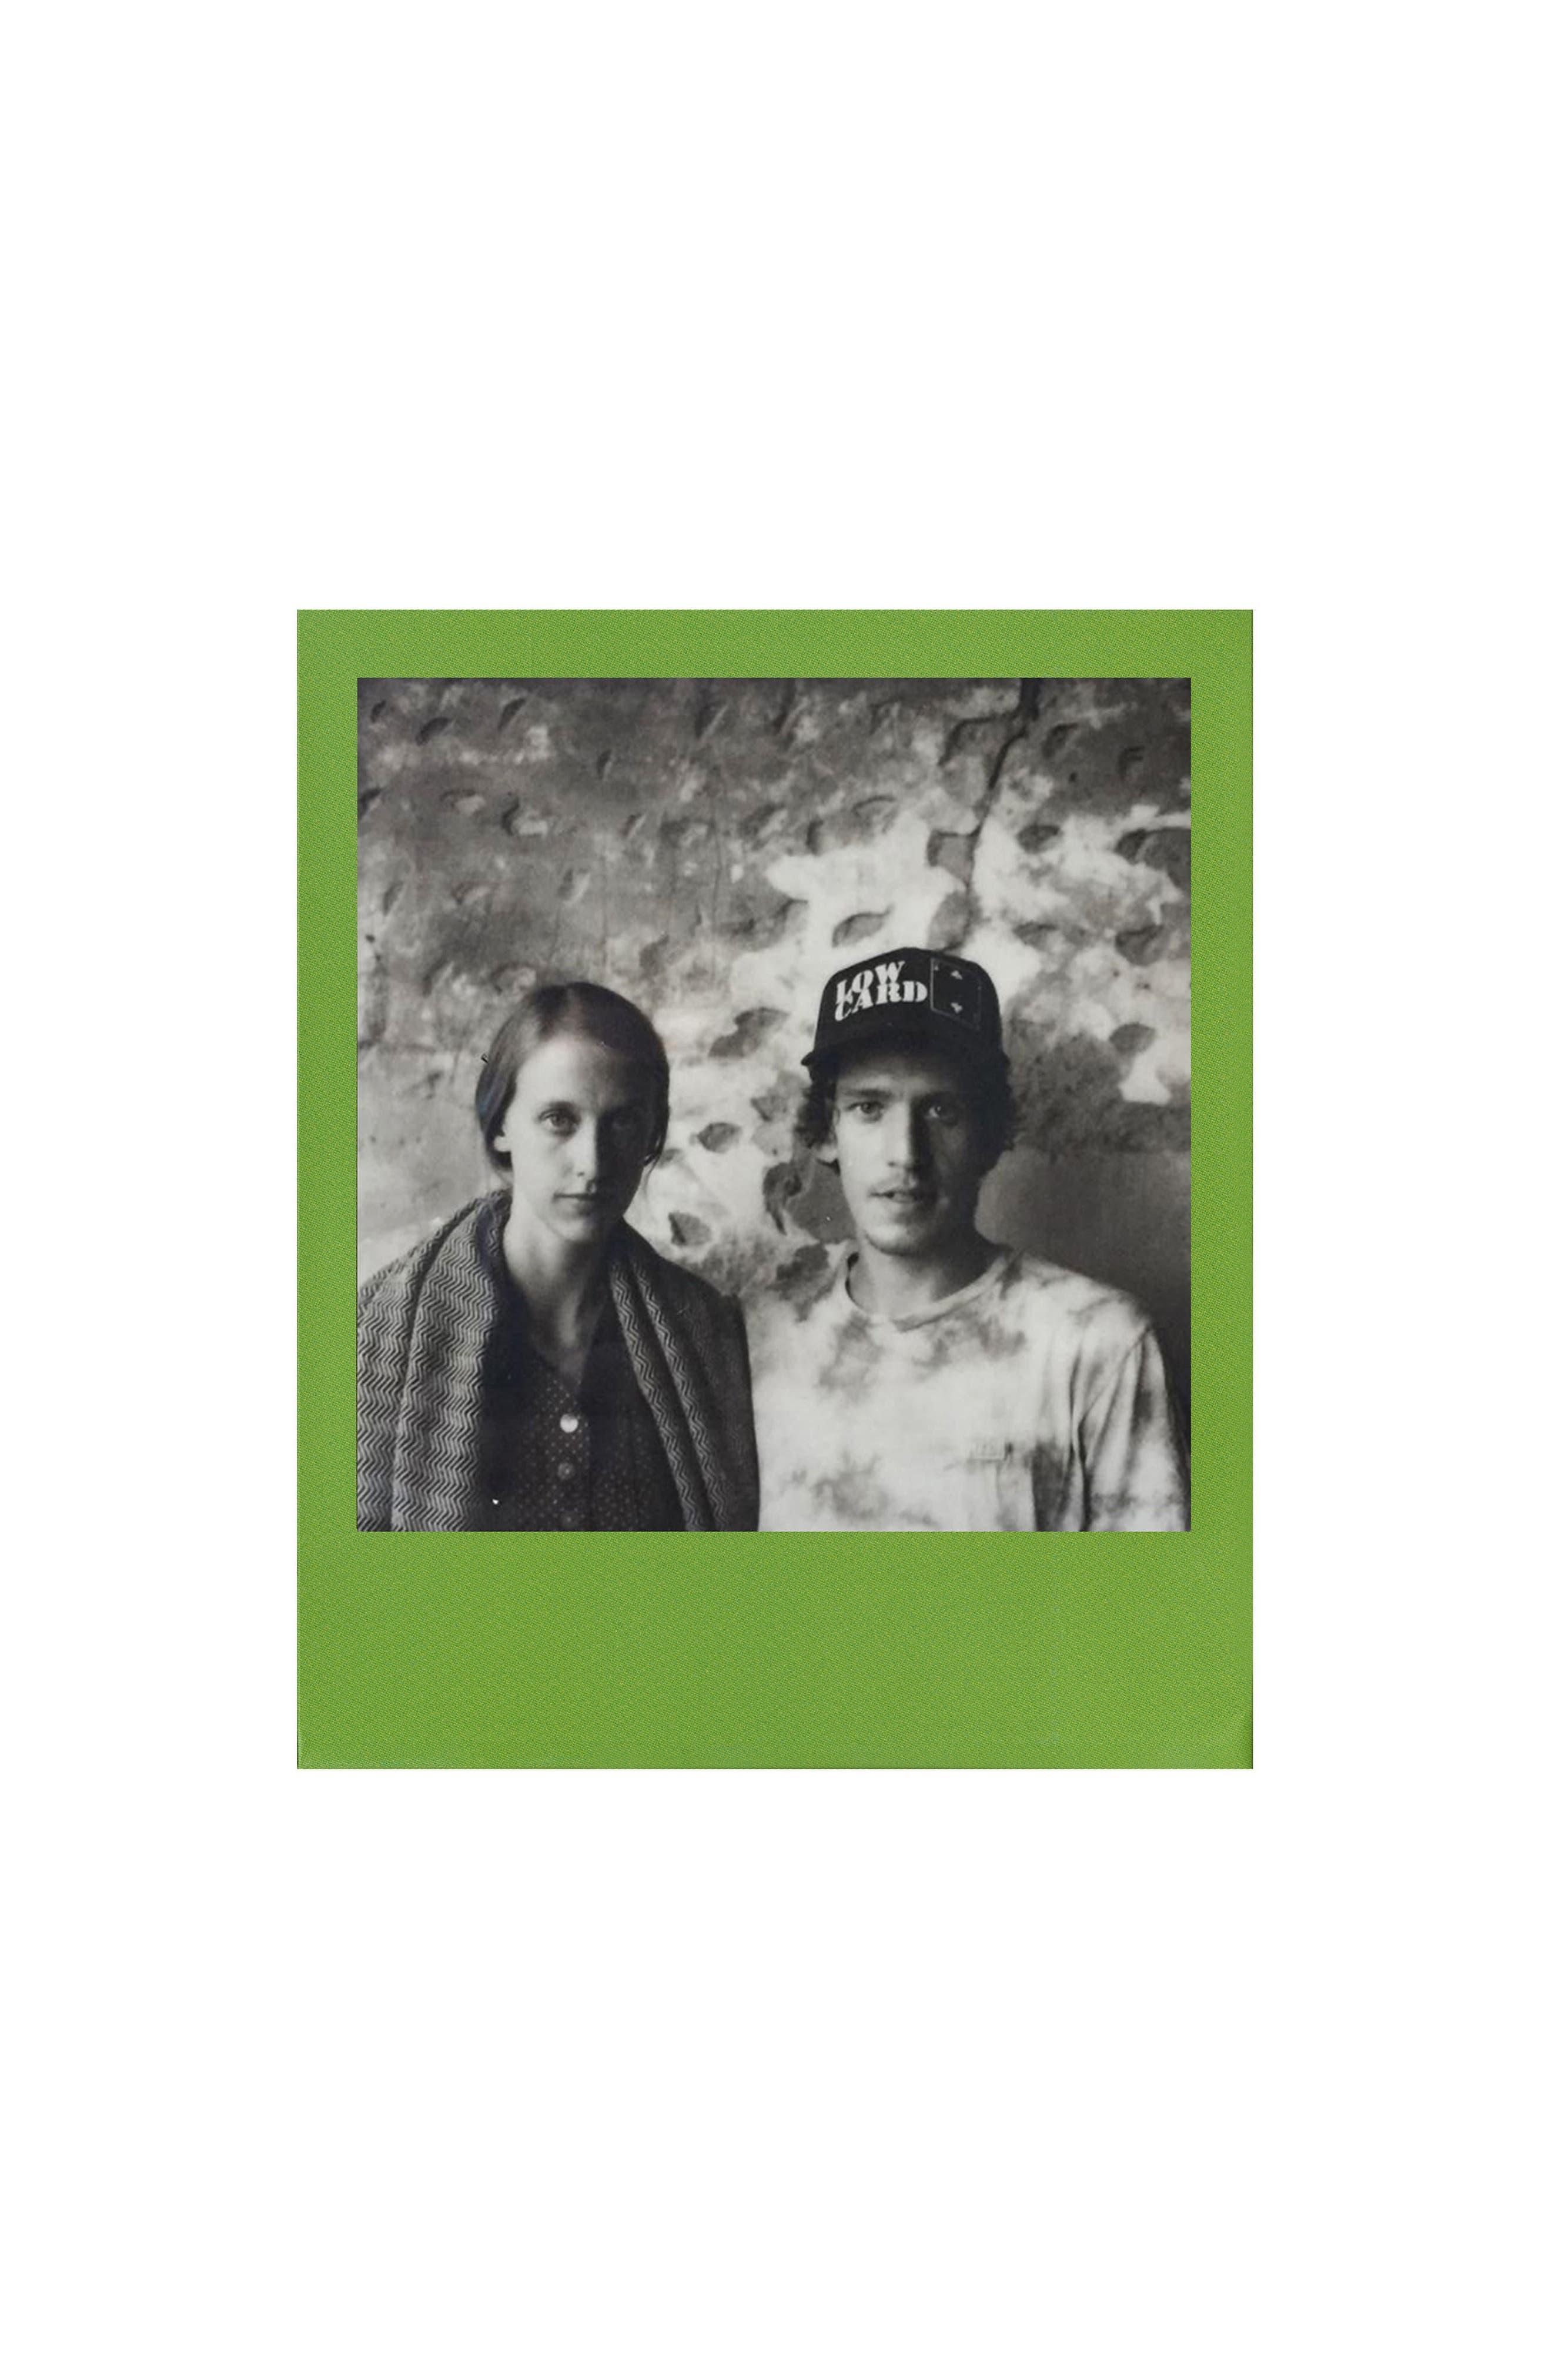 600 Multicolor Frame Black & White Instant Film,                             Alternate thumbnail 4, color,                             NONE